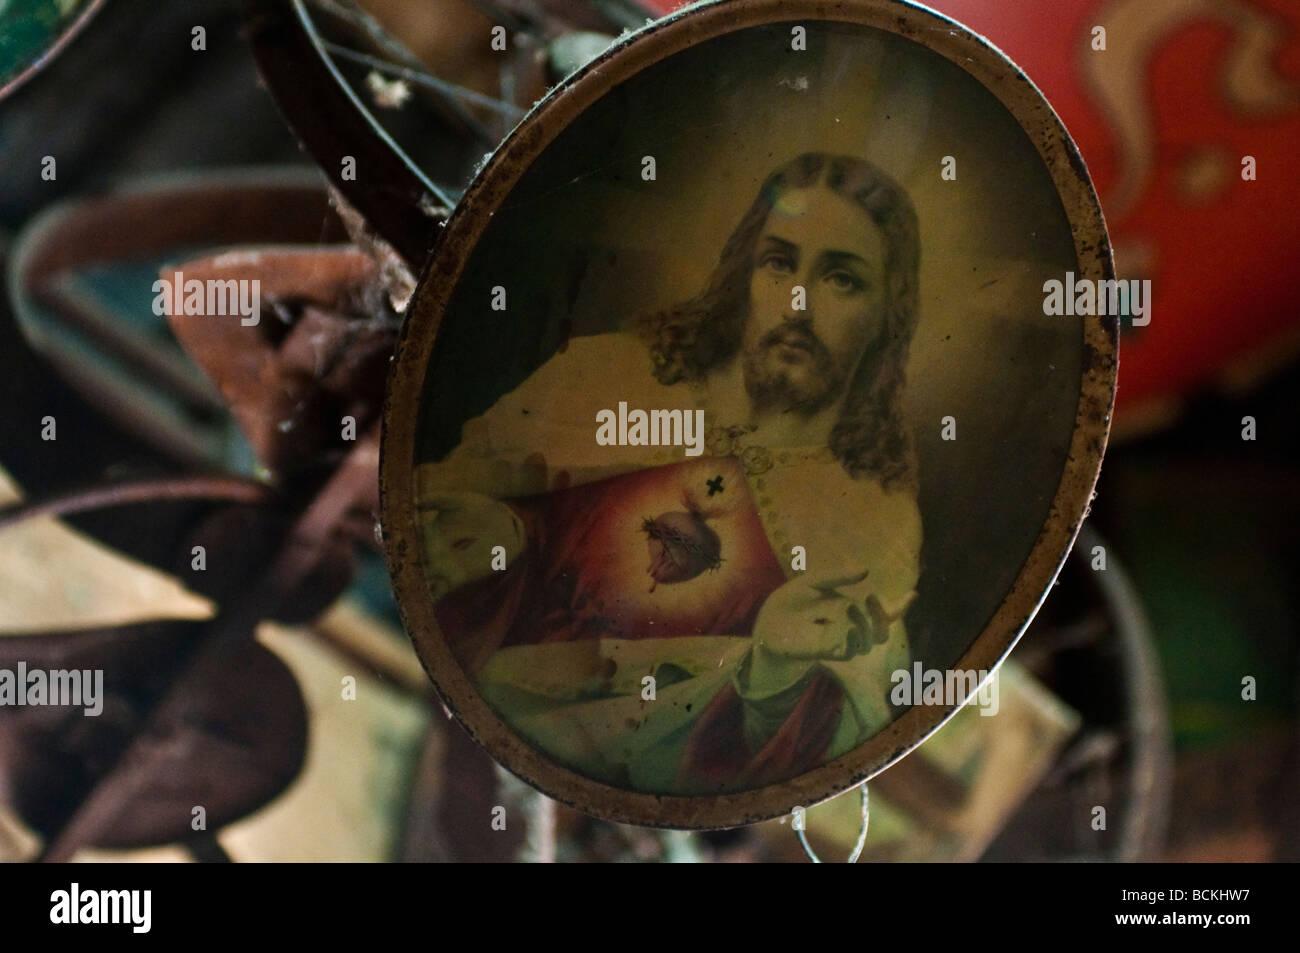 Image of Jesus exhibit in the museum of Nimbin NSW Australia - Stock Image